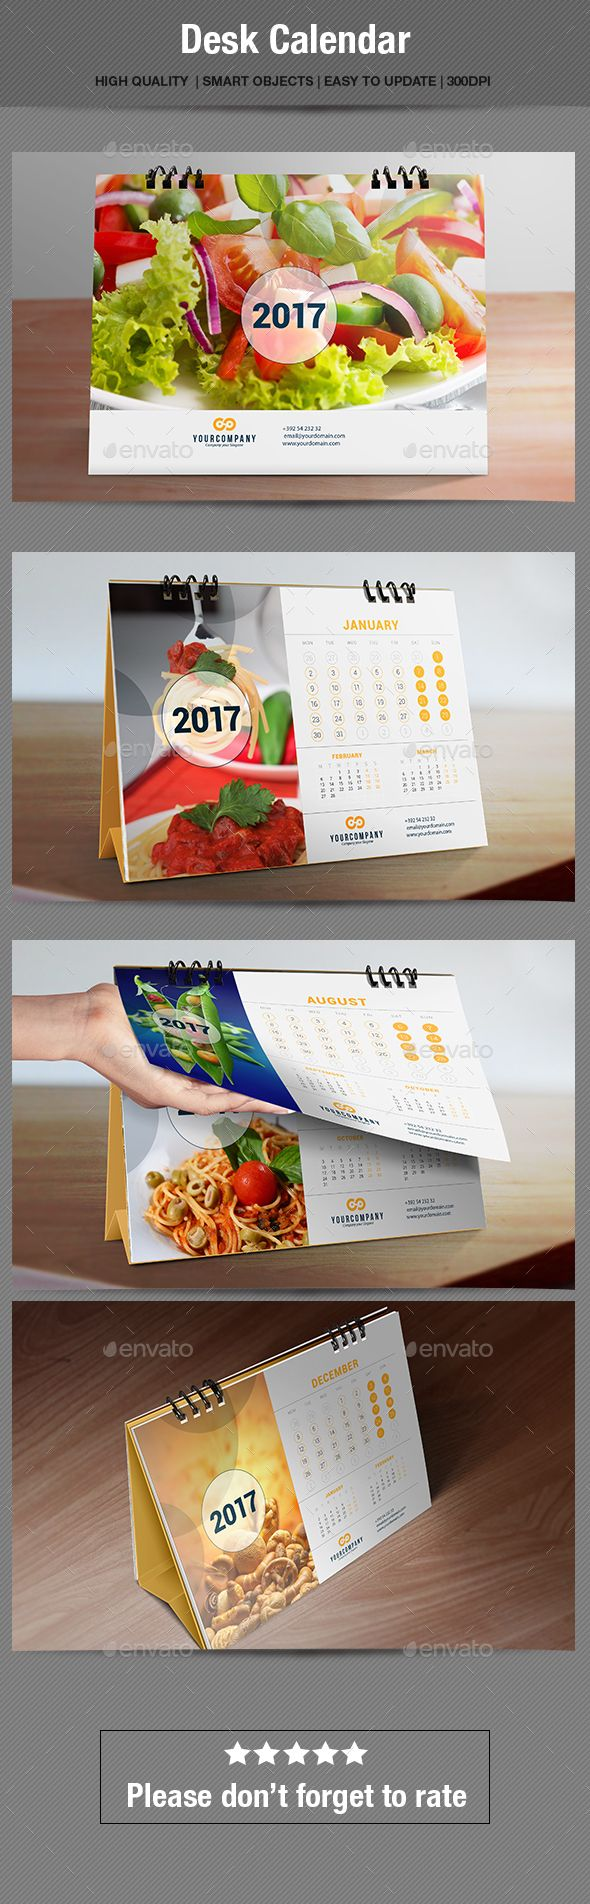 Desk Calendar 2017 Template PSD